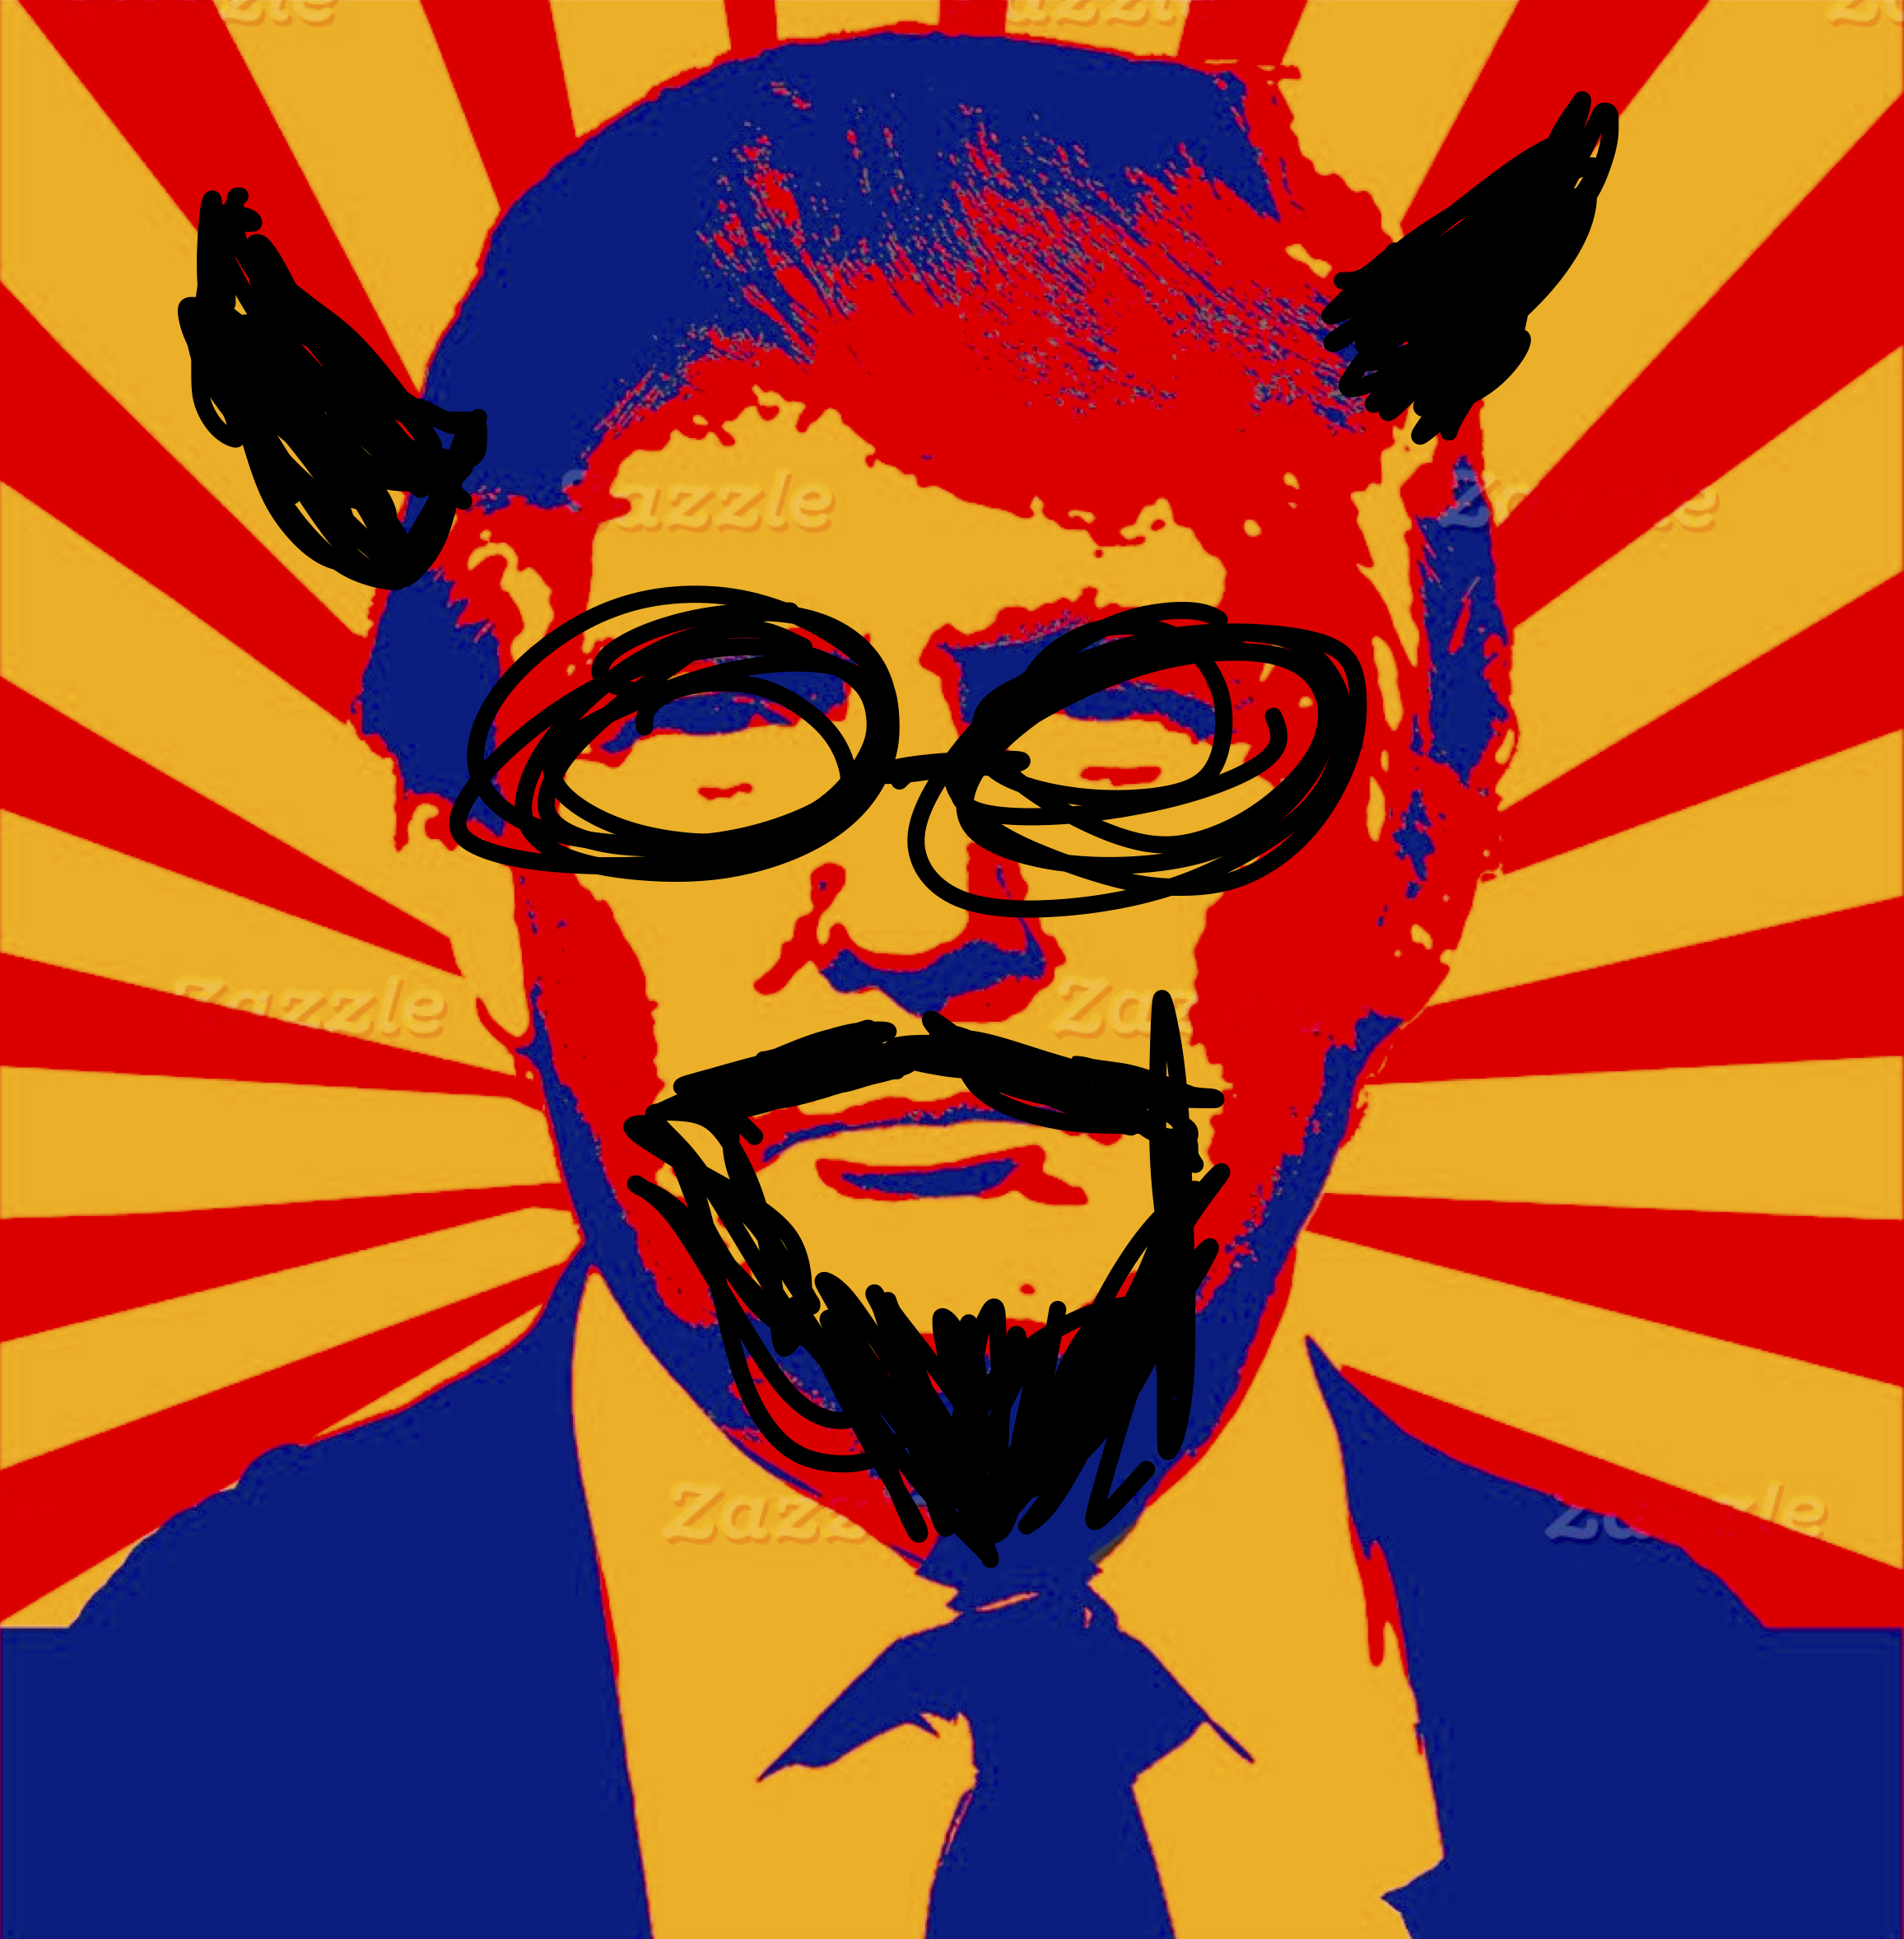 Trump socialitst realism - flattened